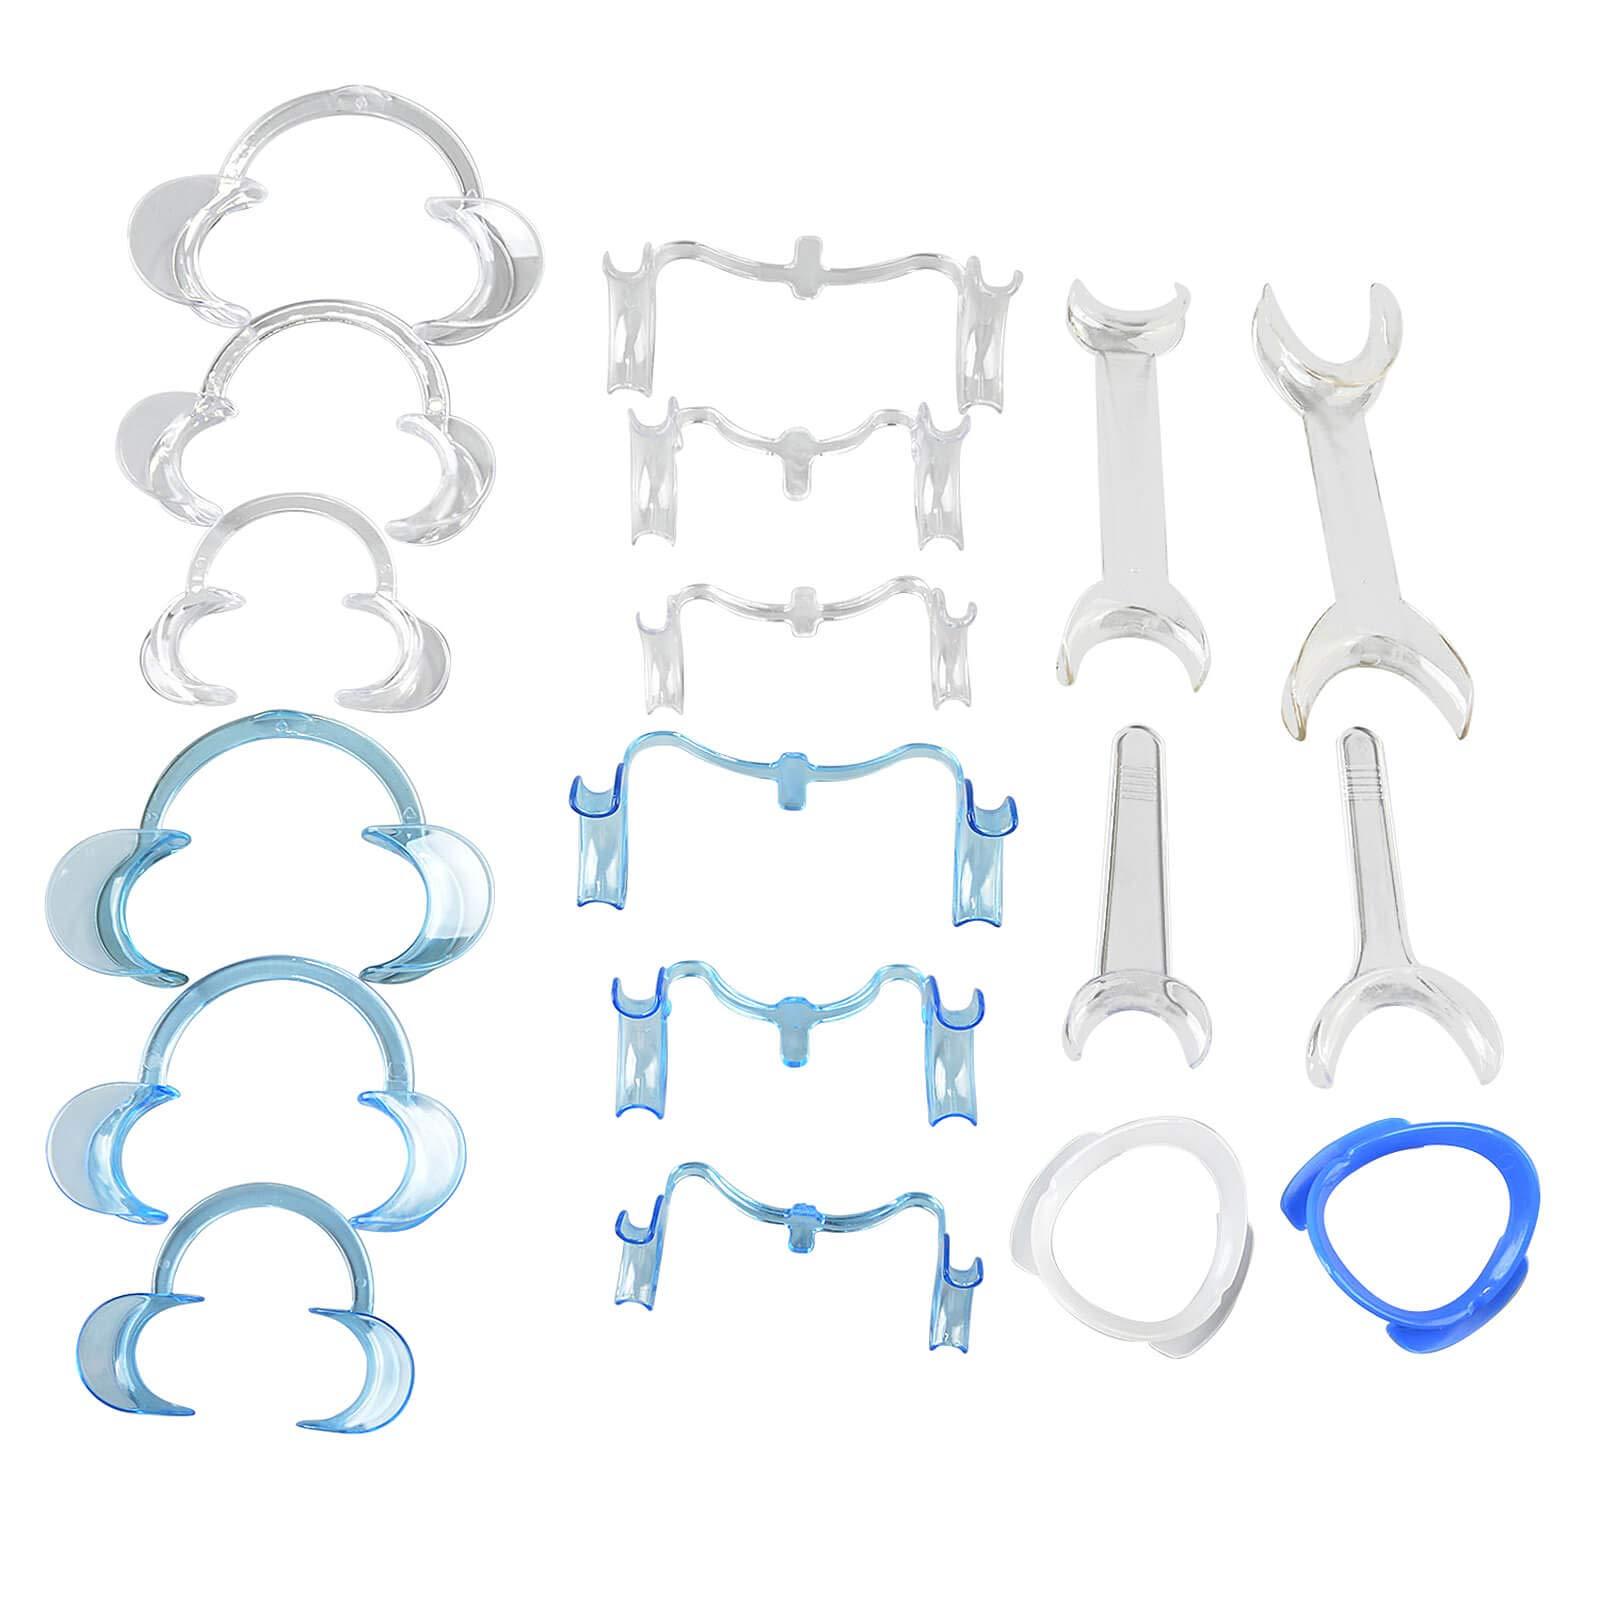 AZDENT Intraoral Dental Cheek Lip Retractor Teeth Whitening Mouth Opener Teeth Retractors Kit Full Size (18pcs/kit)